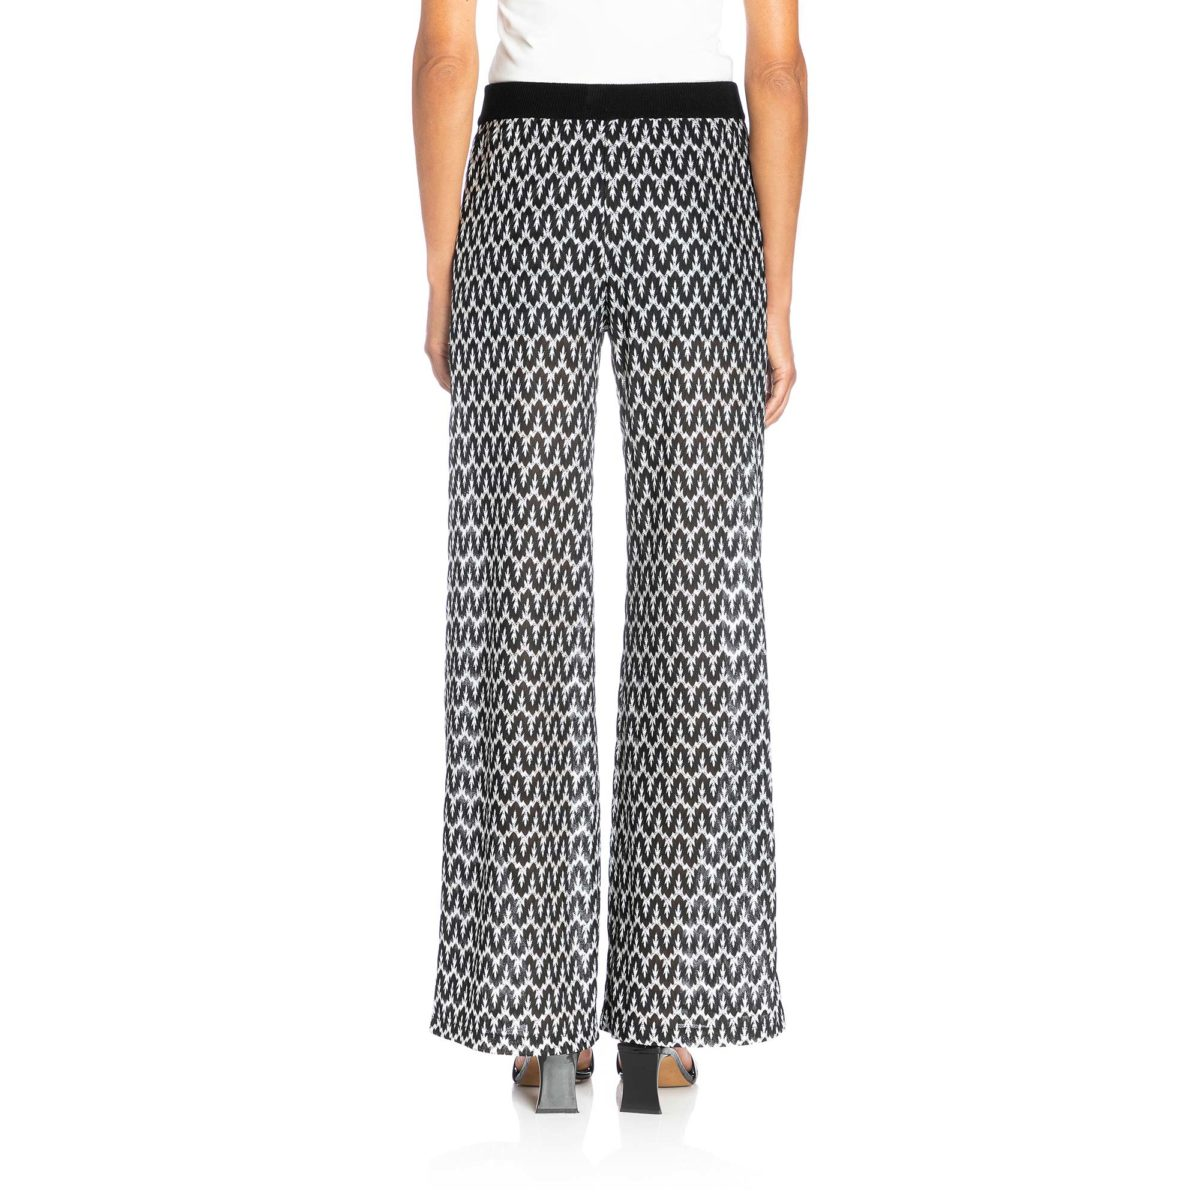 Pantalone Wide leg a maglia raschel Bianco/Nero - Nicla